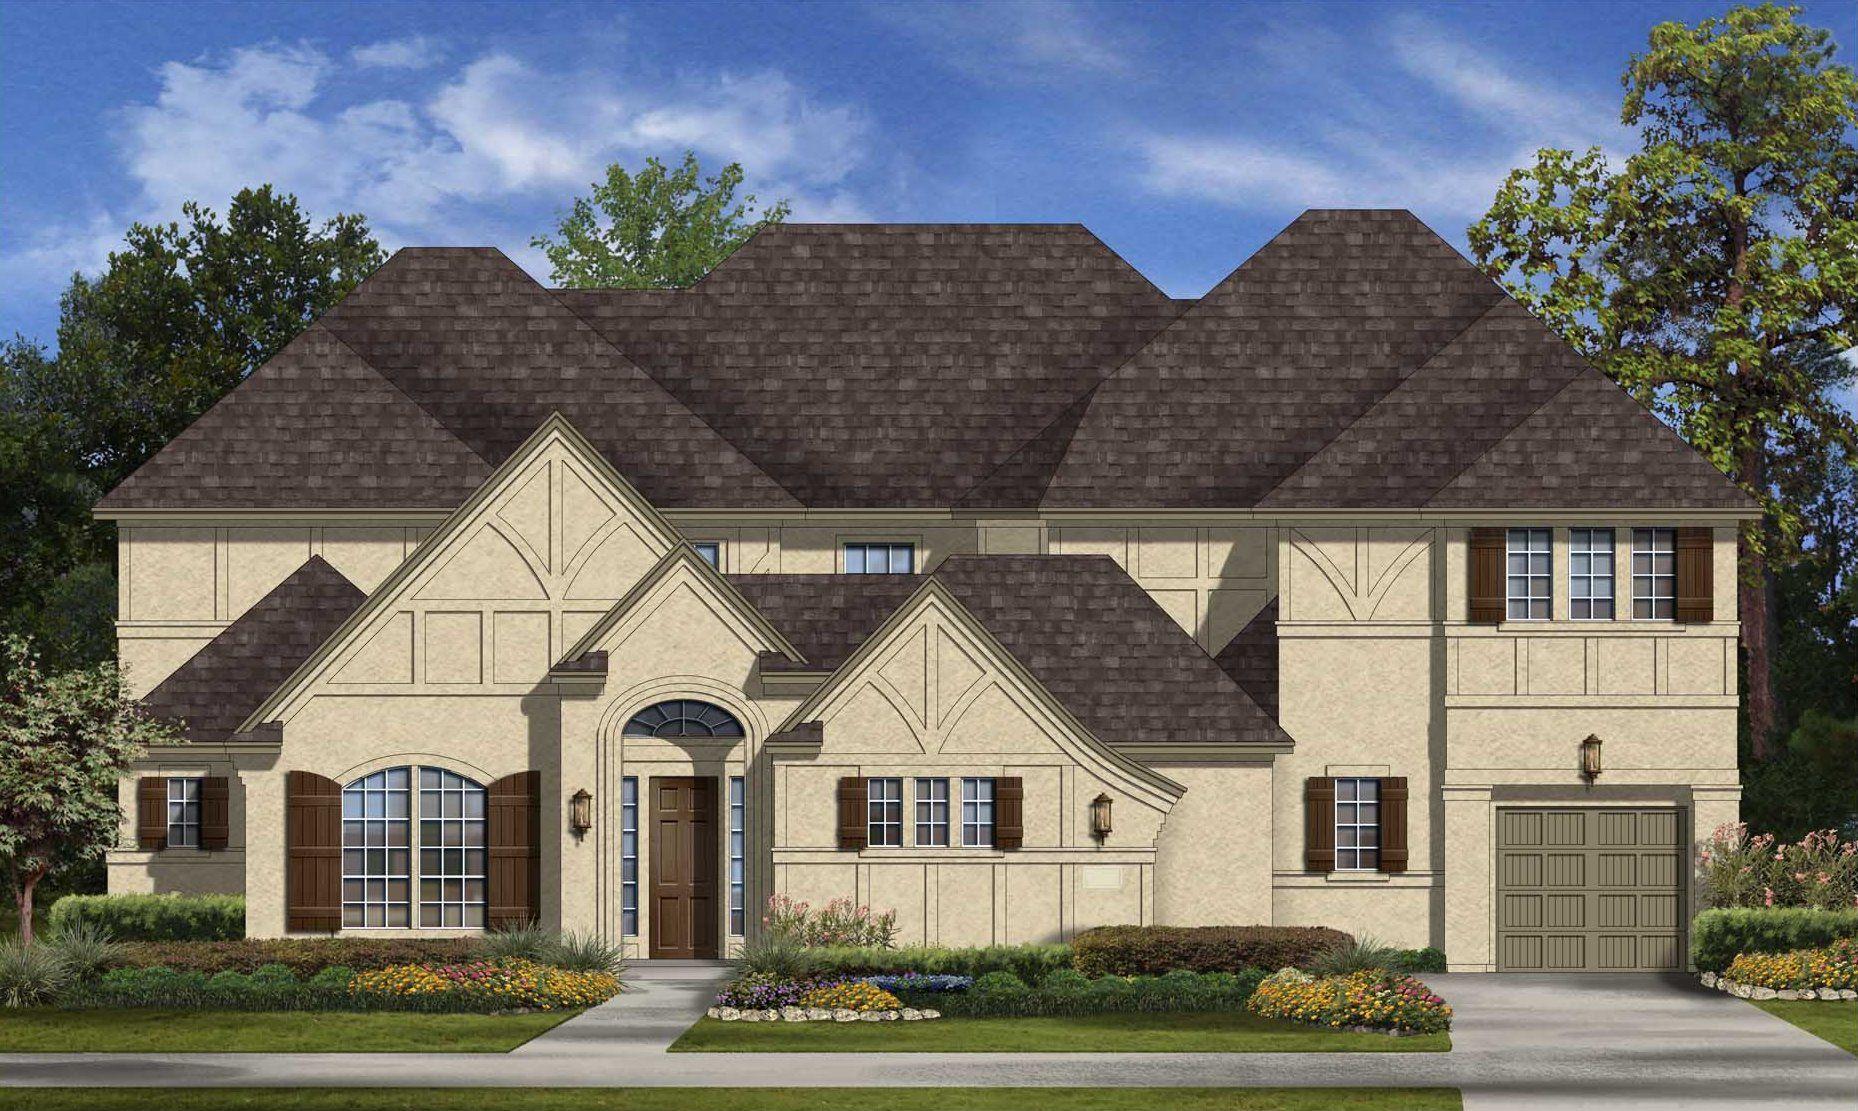 Single Family for Sale at Positano 5219 Isidore Lane Missouri City, Texas 77459 United States